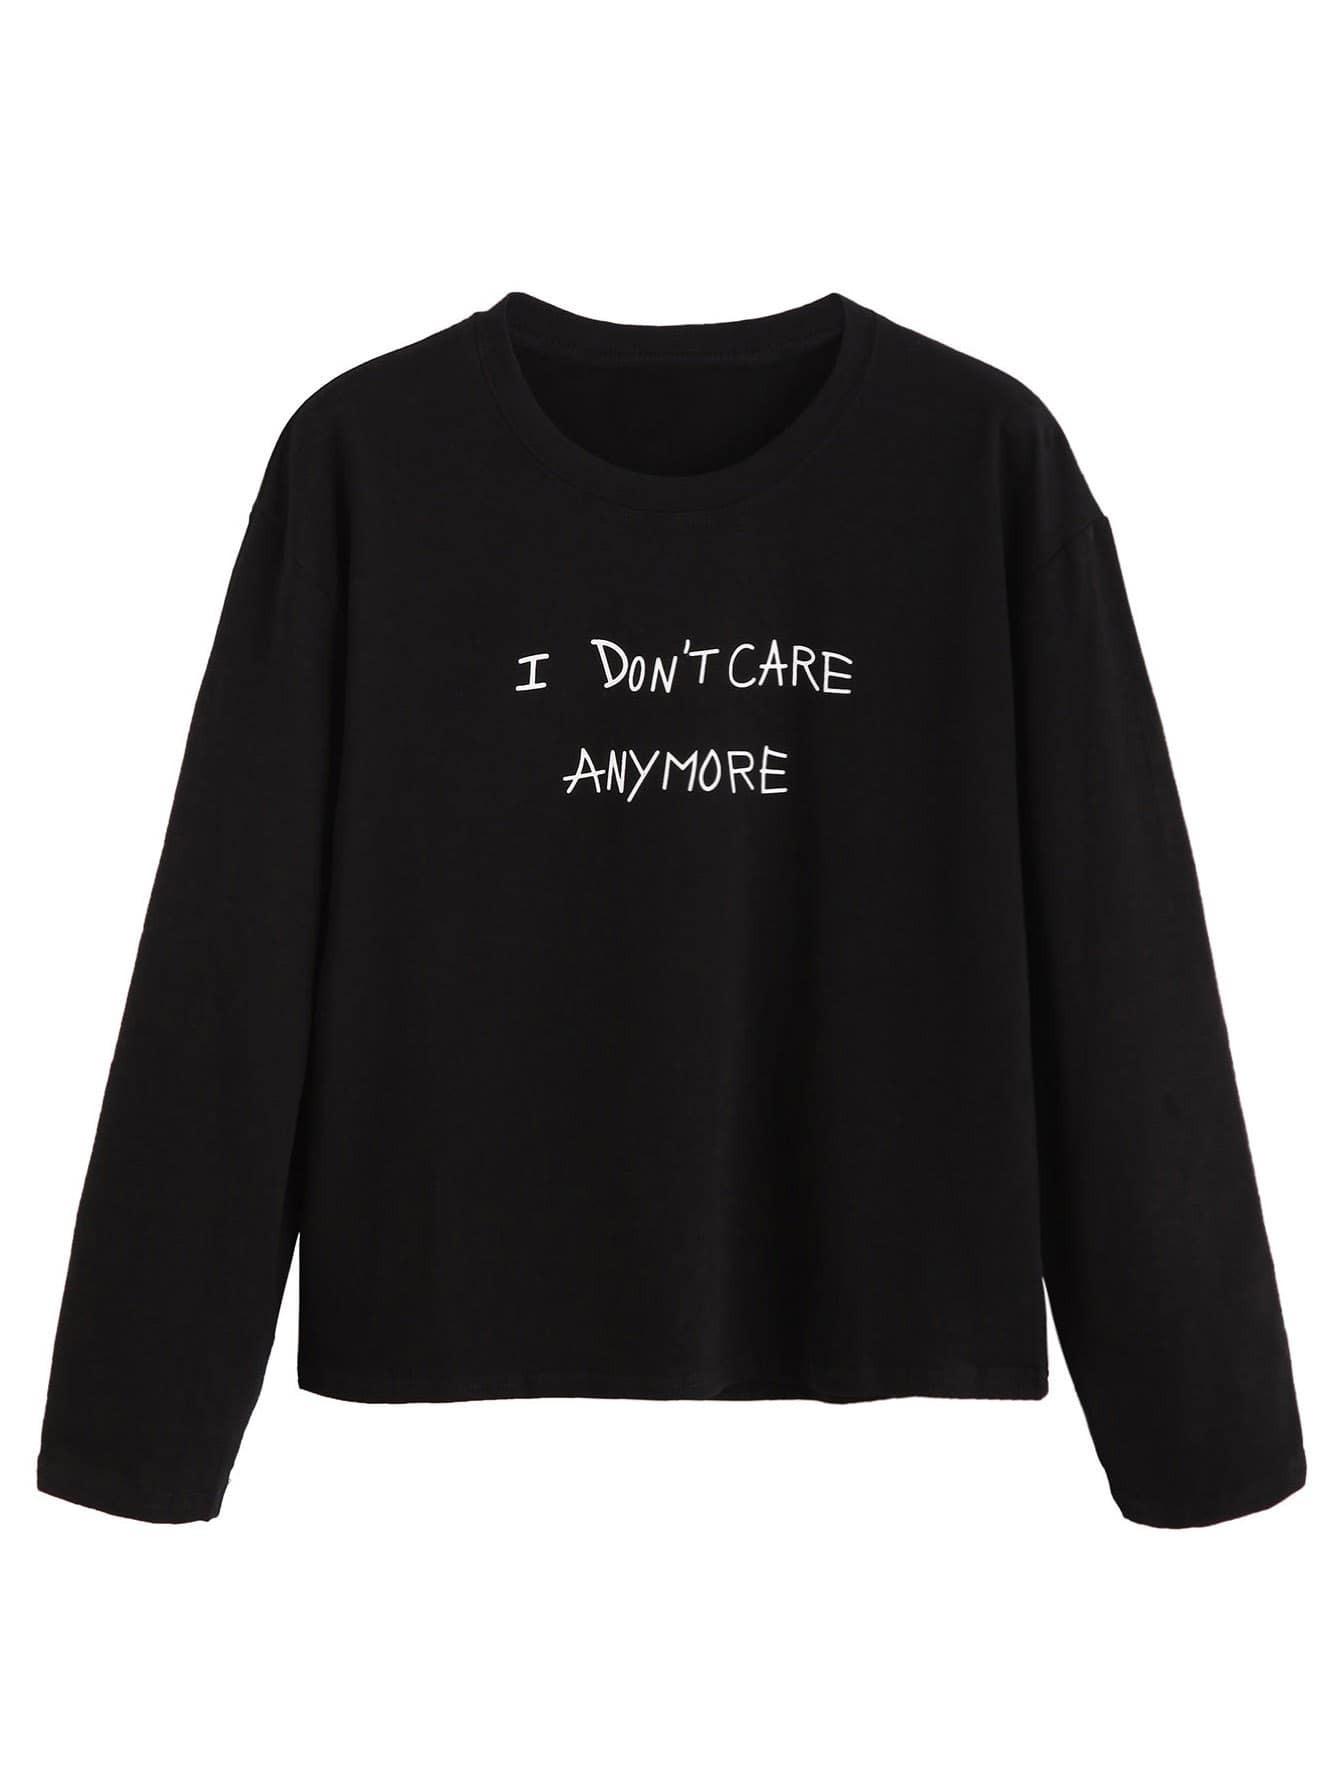 Black Slogan Print T-shirt RTSH160905120